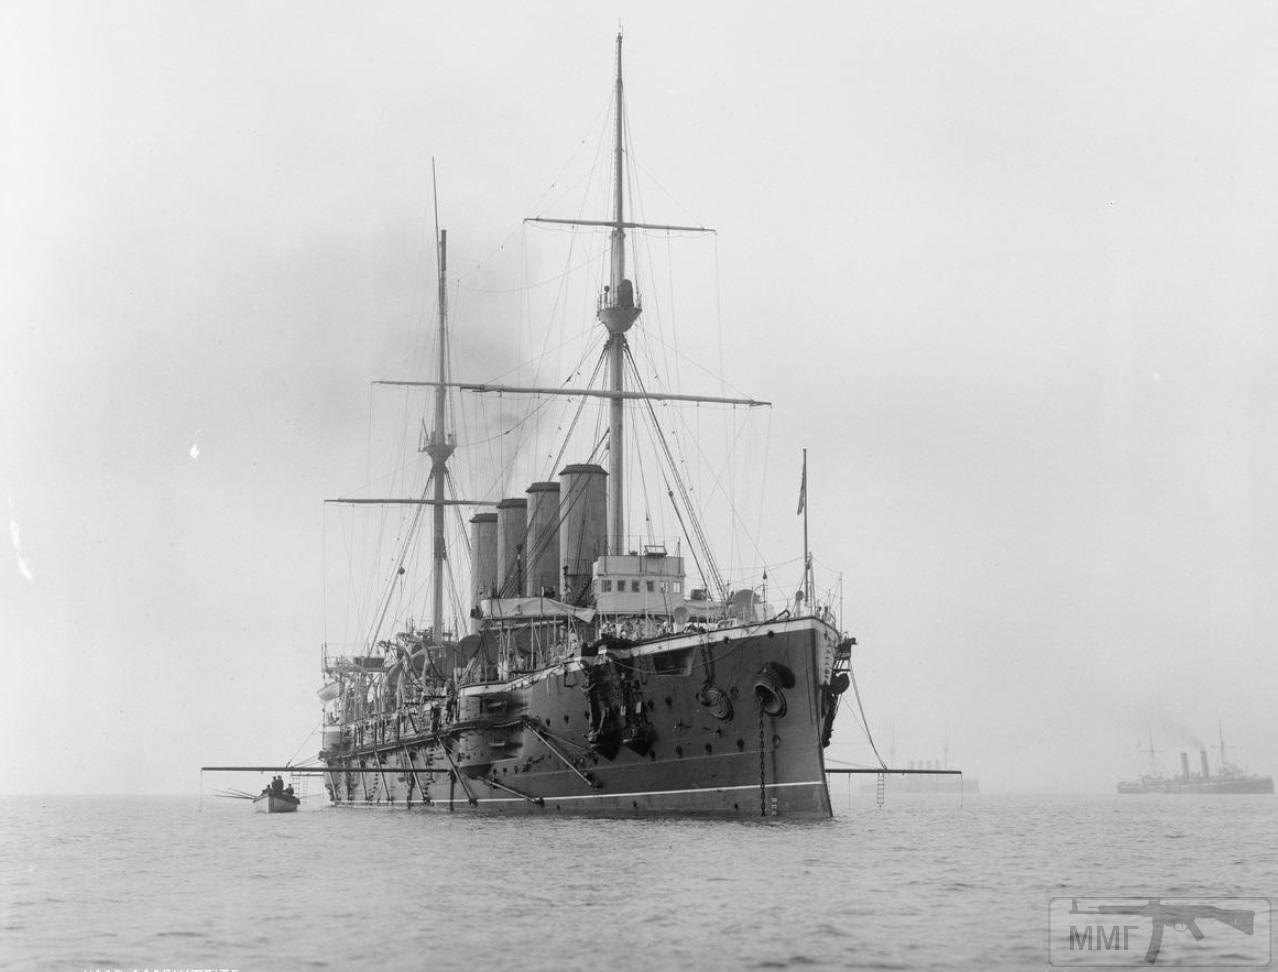 69136 - HMS Amphitrite